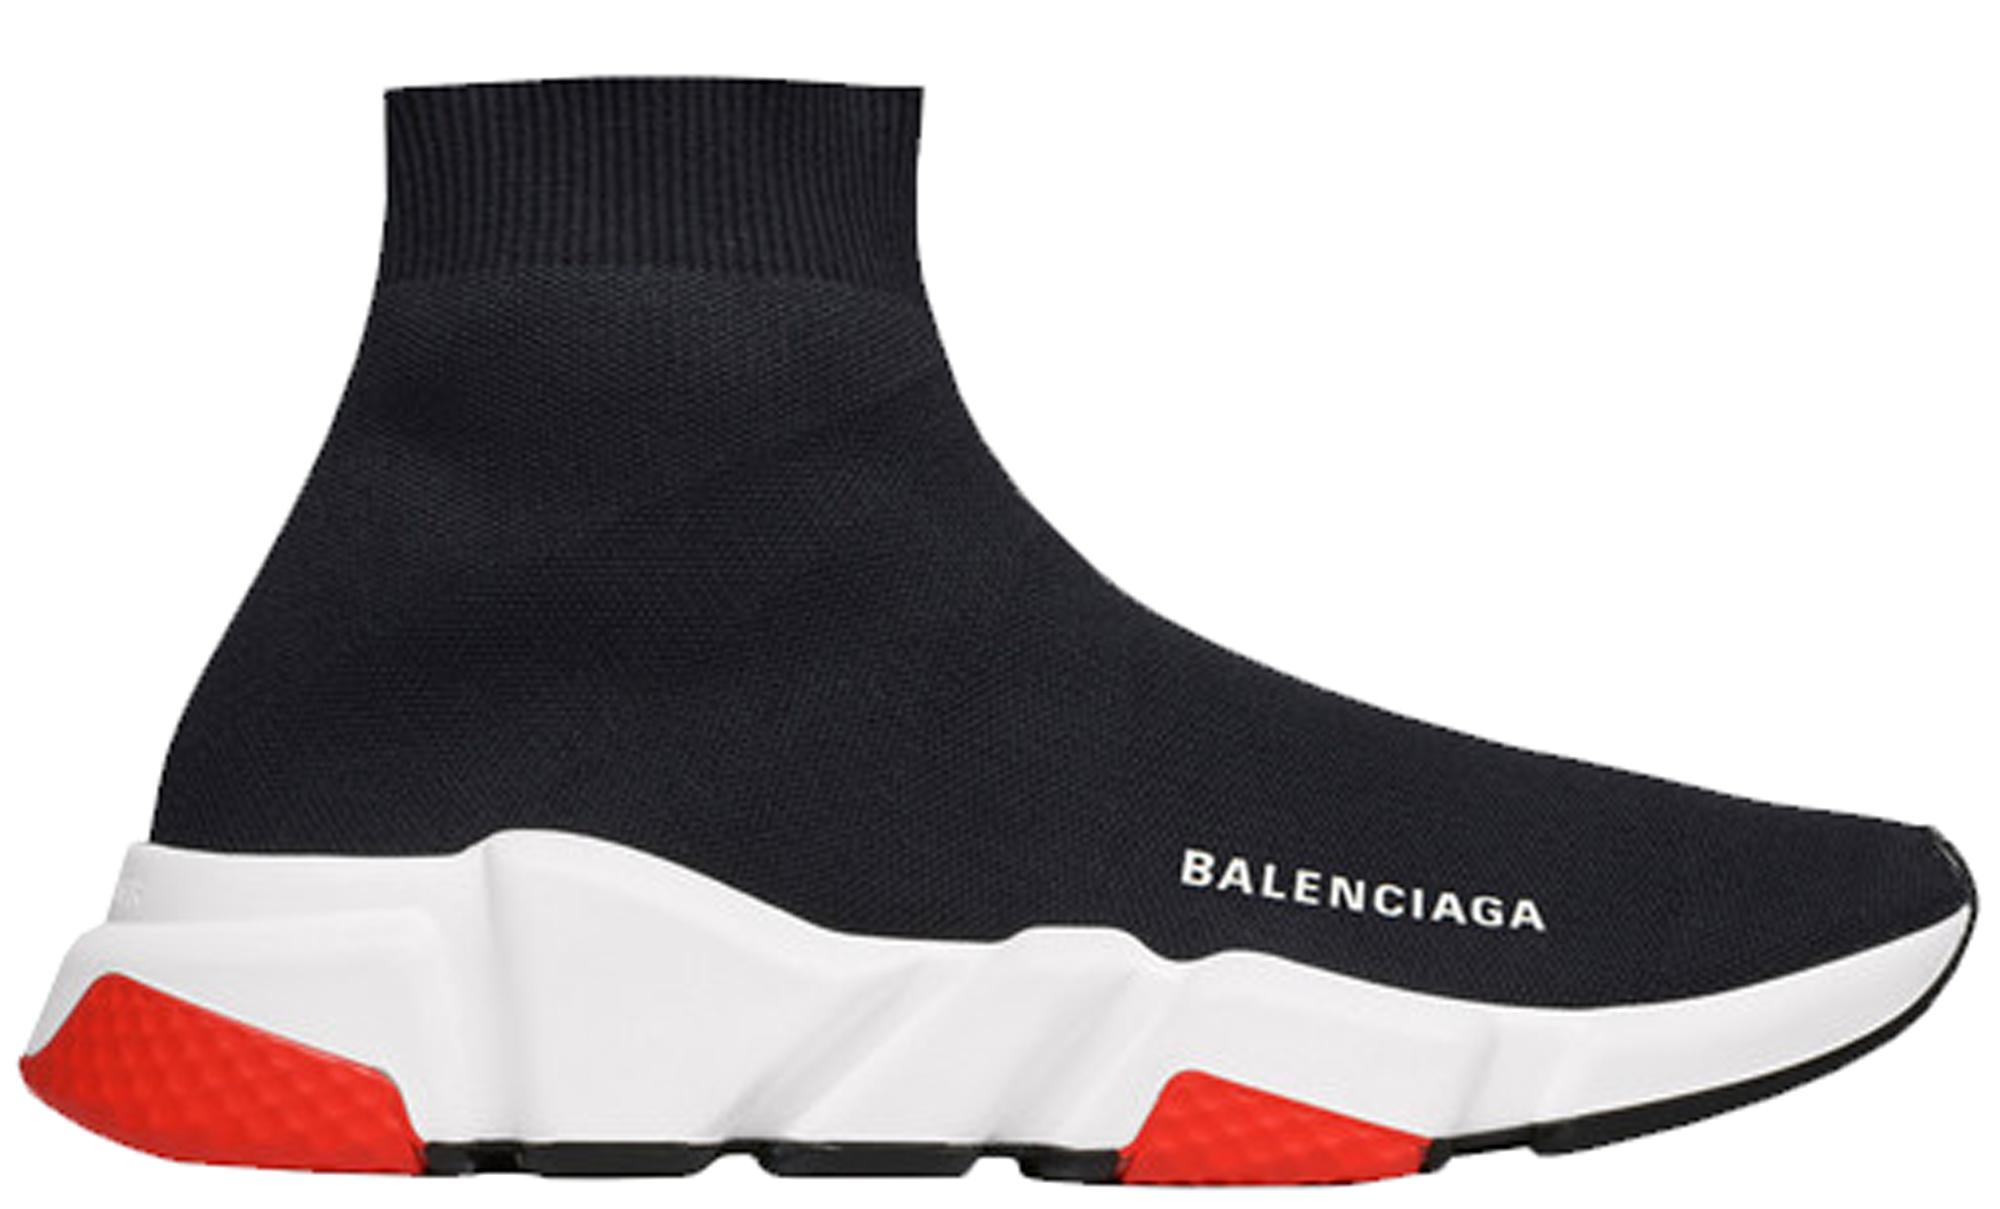 Balenciaga Speed Trainer Black Red 2019 (W)